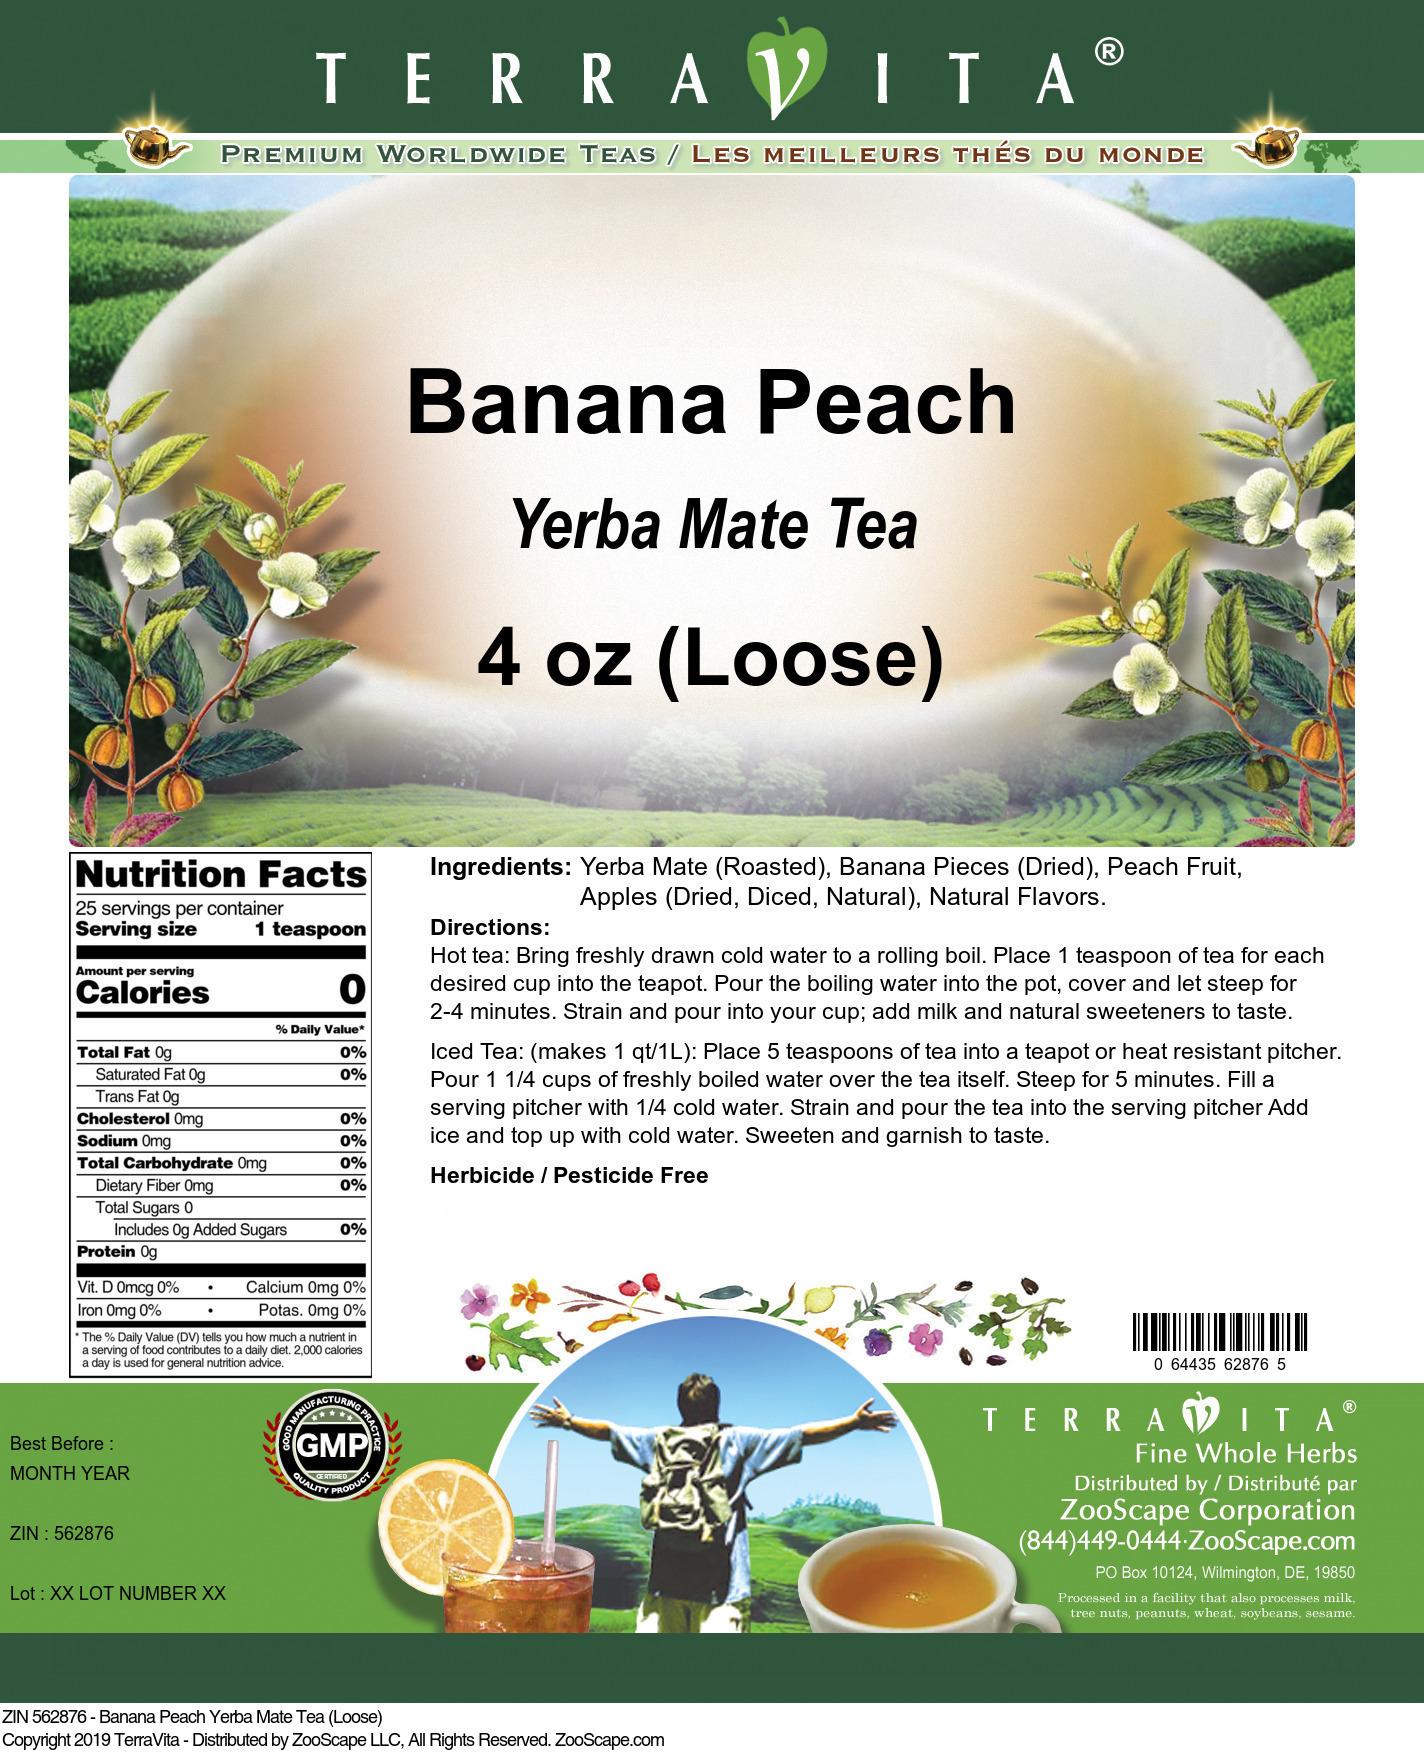 Banana Peach Yerba Mate Tea (Loose)